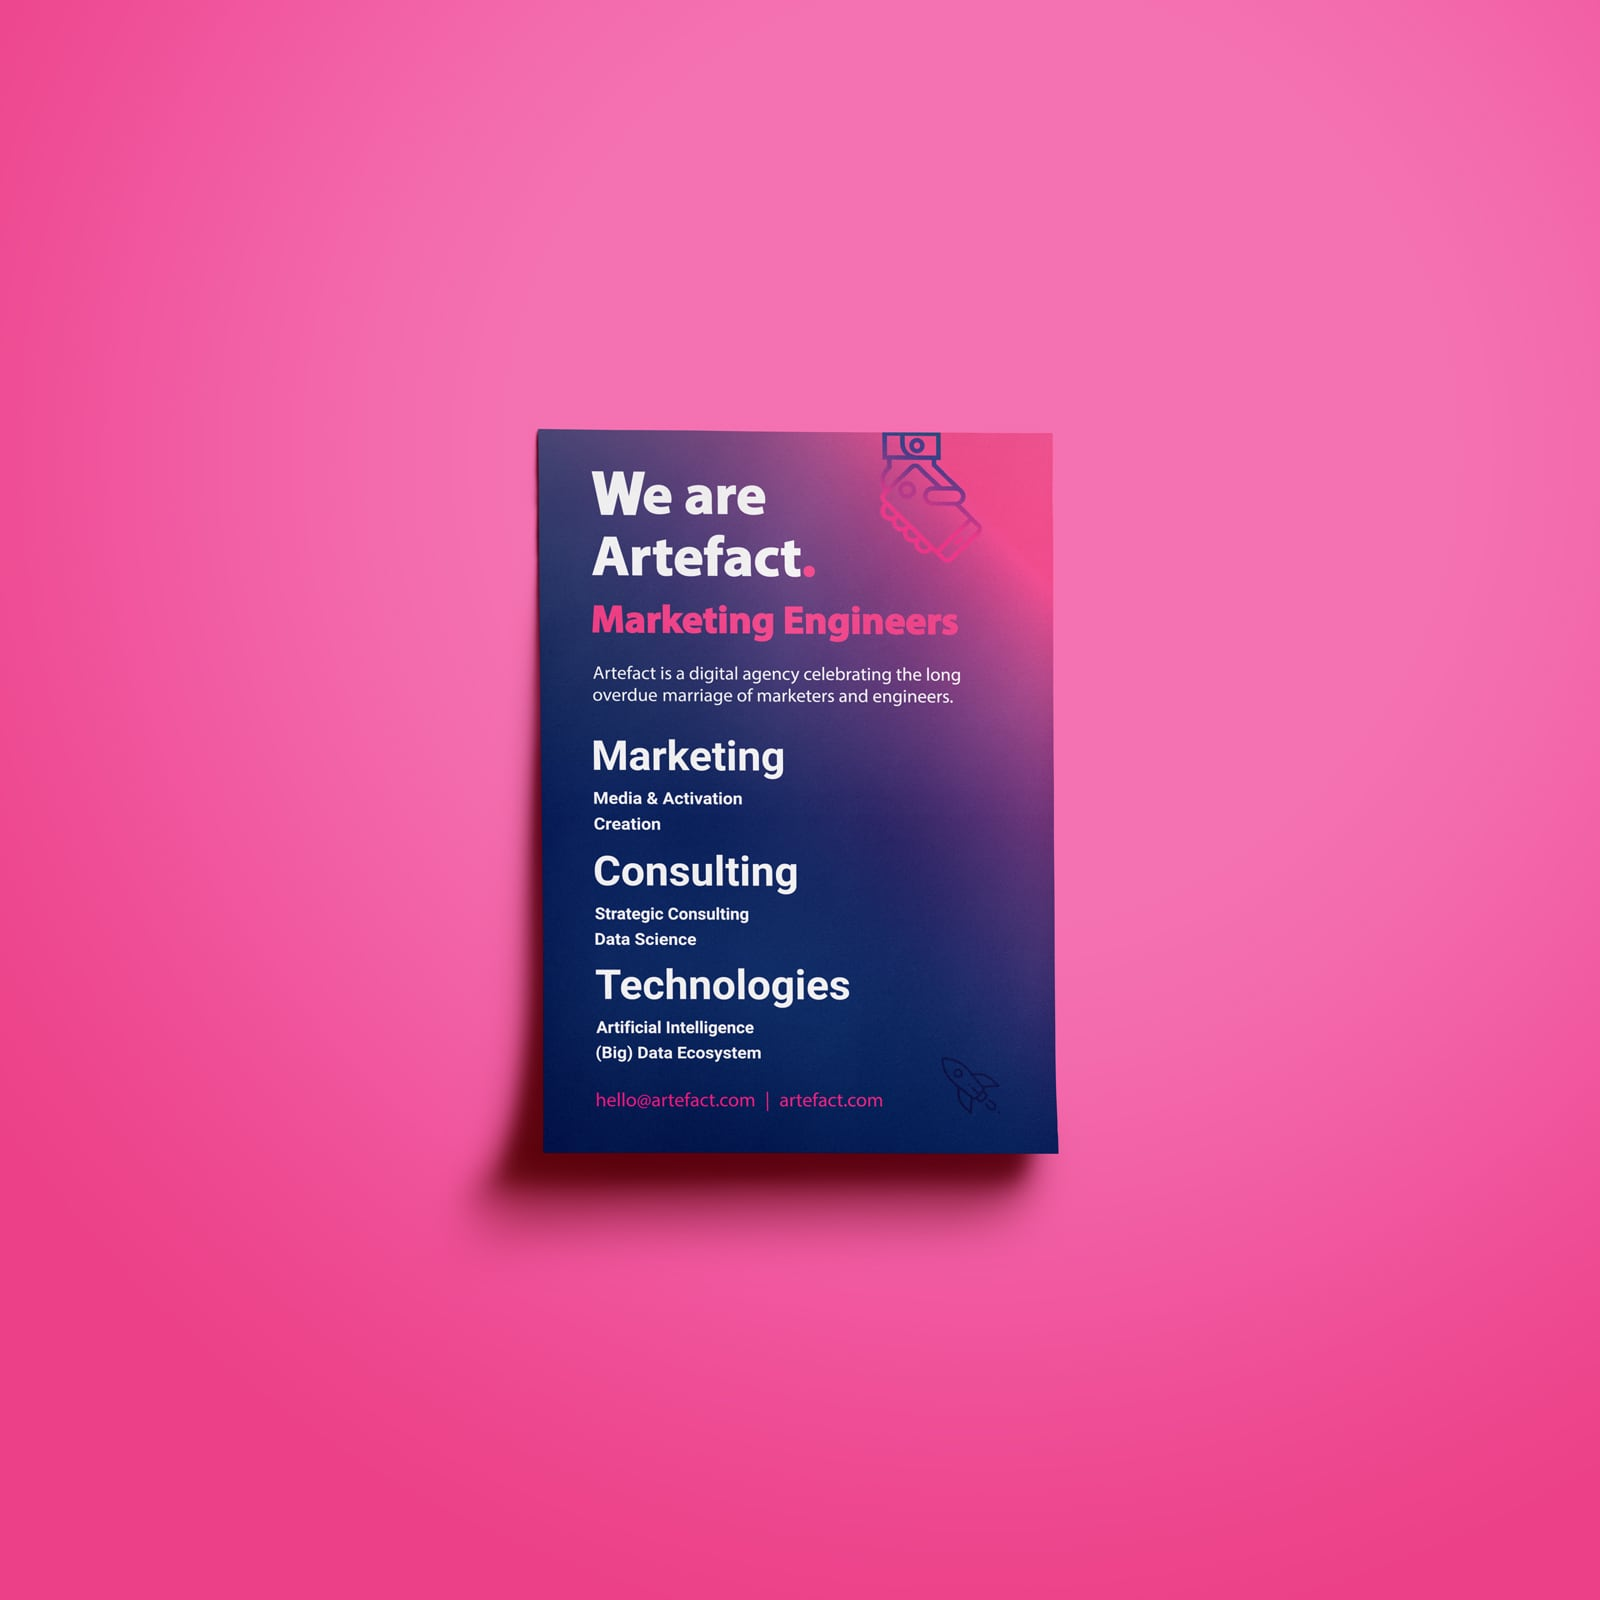 artefact-flyer-communication-print-branding-2